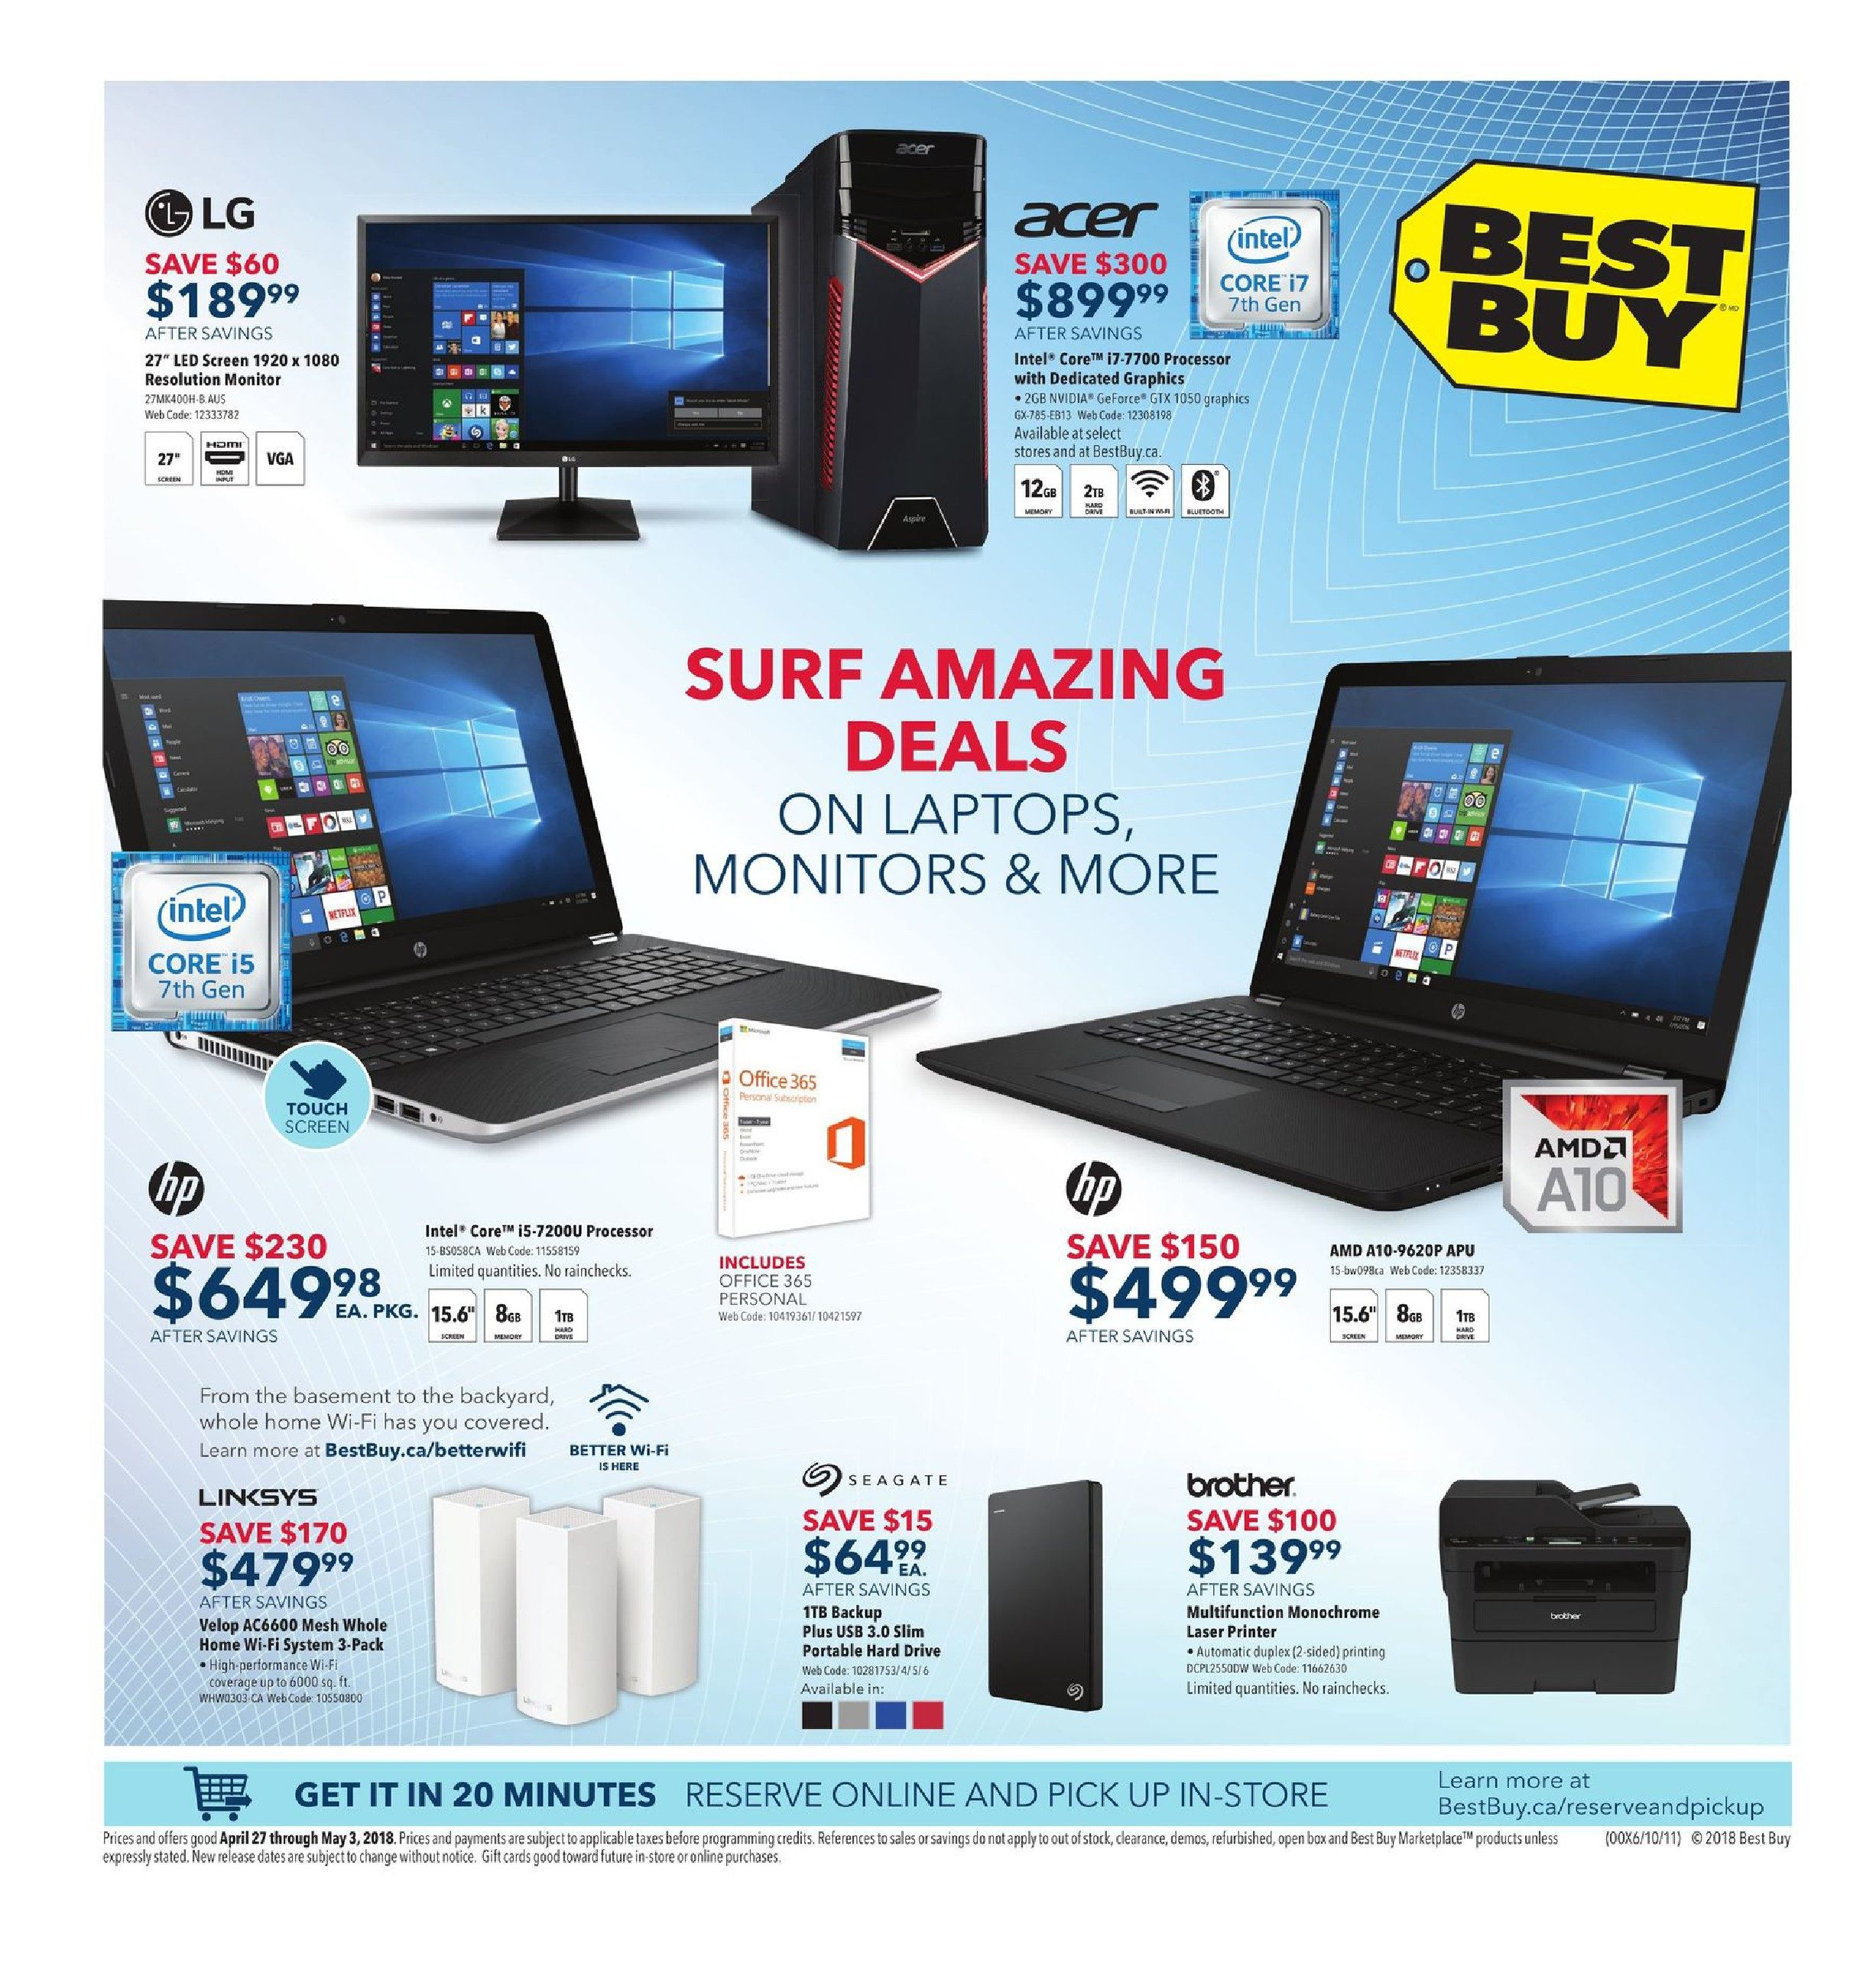 Best Buy Weekly Flyer - Weekly - Surf Amazing Deals - Apr 27 – May 3 -  RedFlagDeals.com